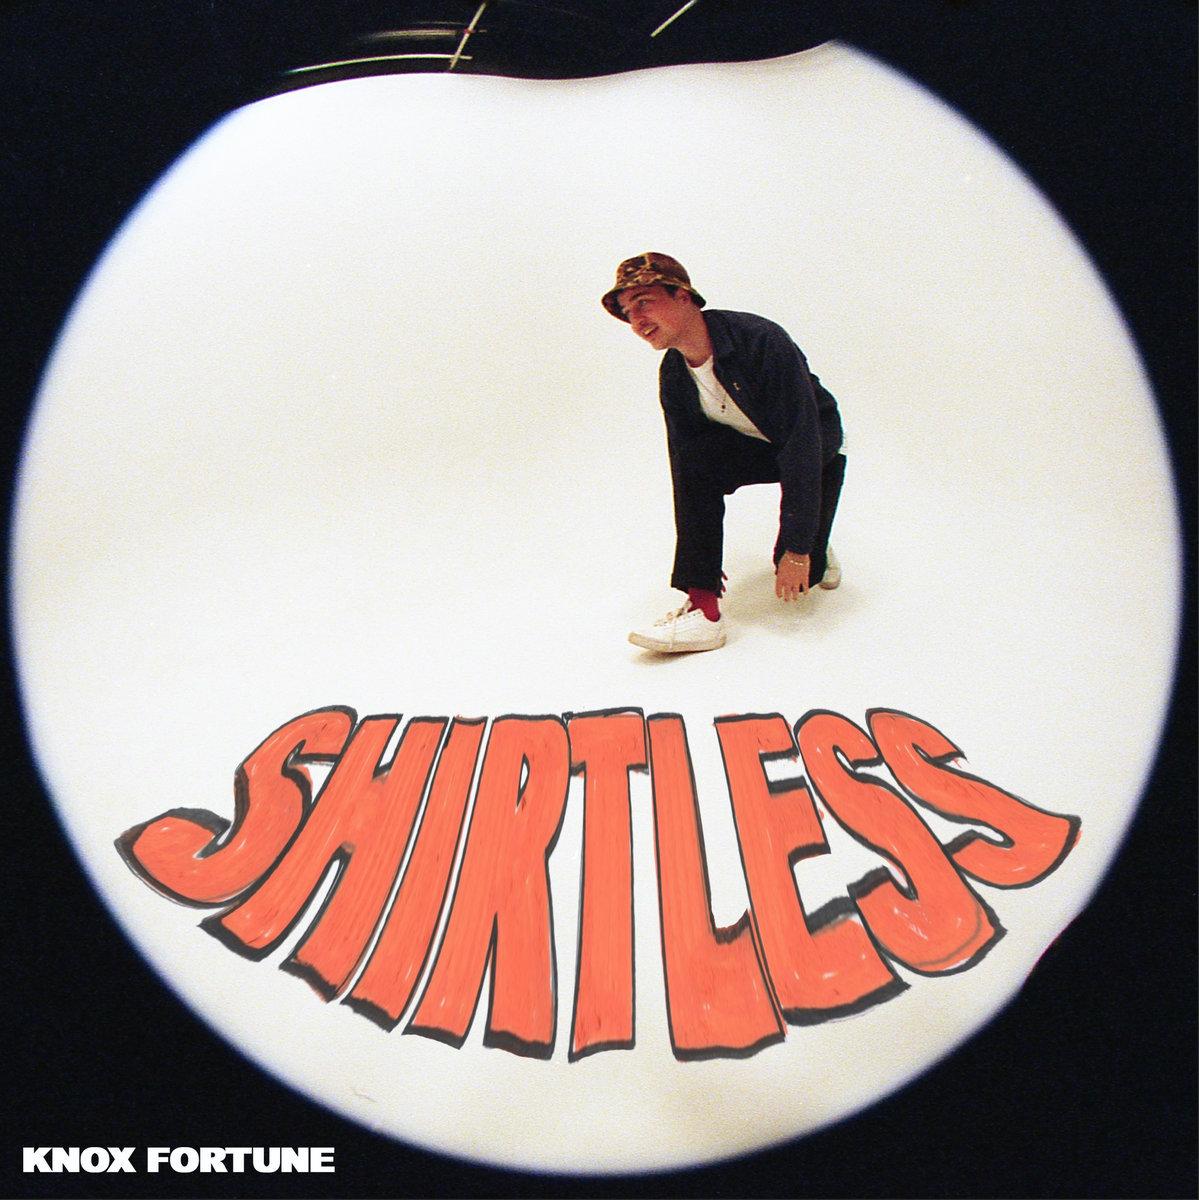 knox fortune shirtless artwork Knox Fortune Announces New Album Stock Child Wonder, Shares Shirtless: Stream